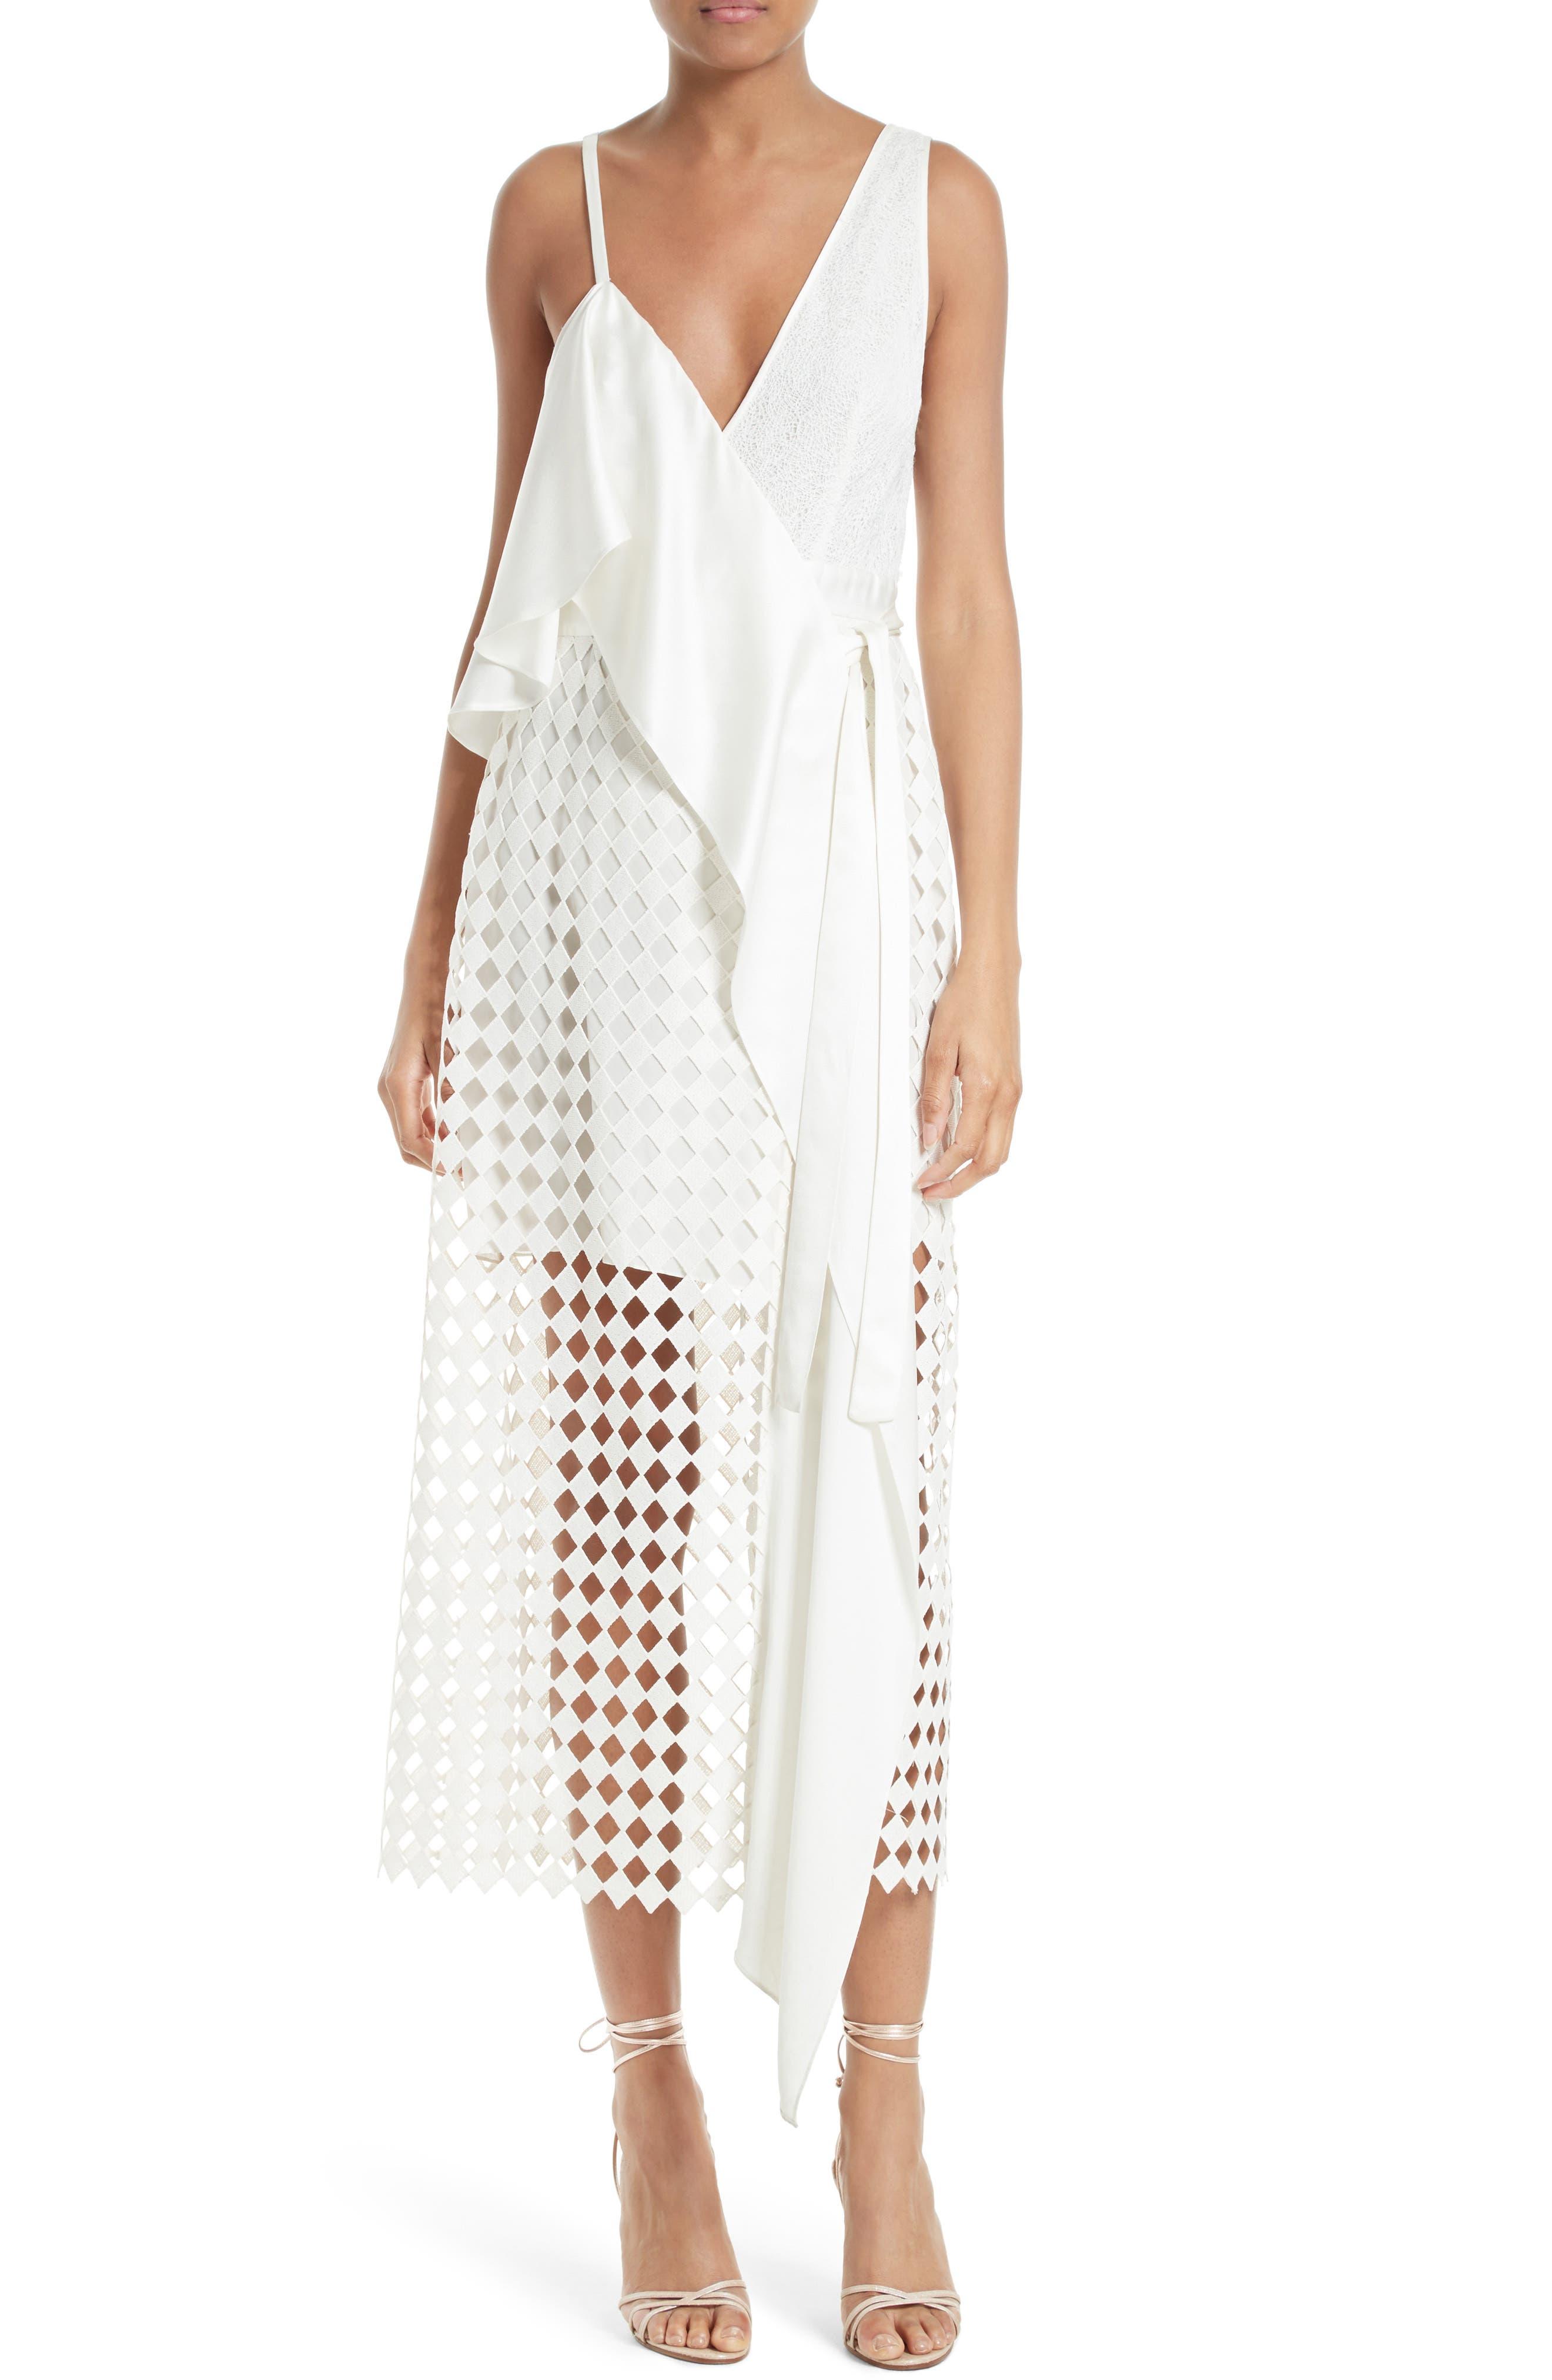 Alternate Image 1 Selected - Diane von Furstenberg Asymmetrical Ruffle Mixed Media Wrap Dress